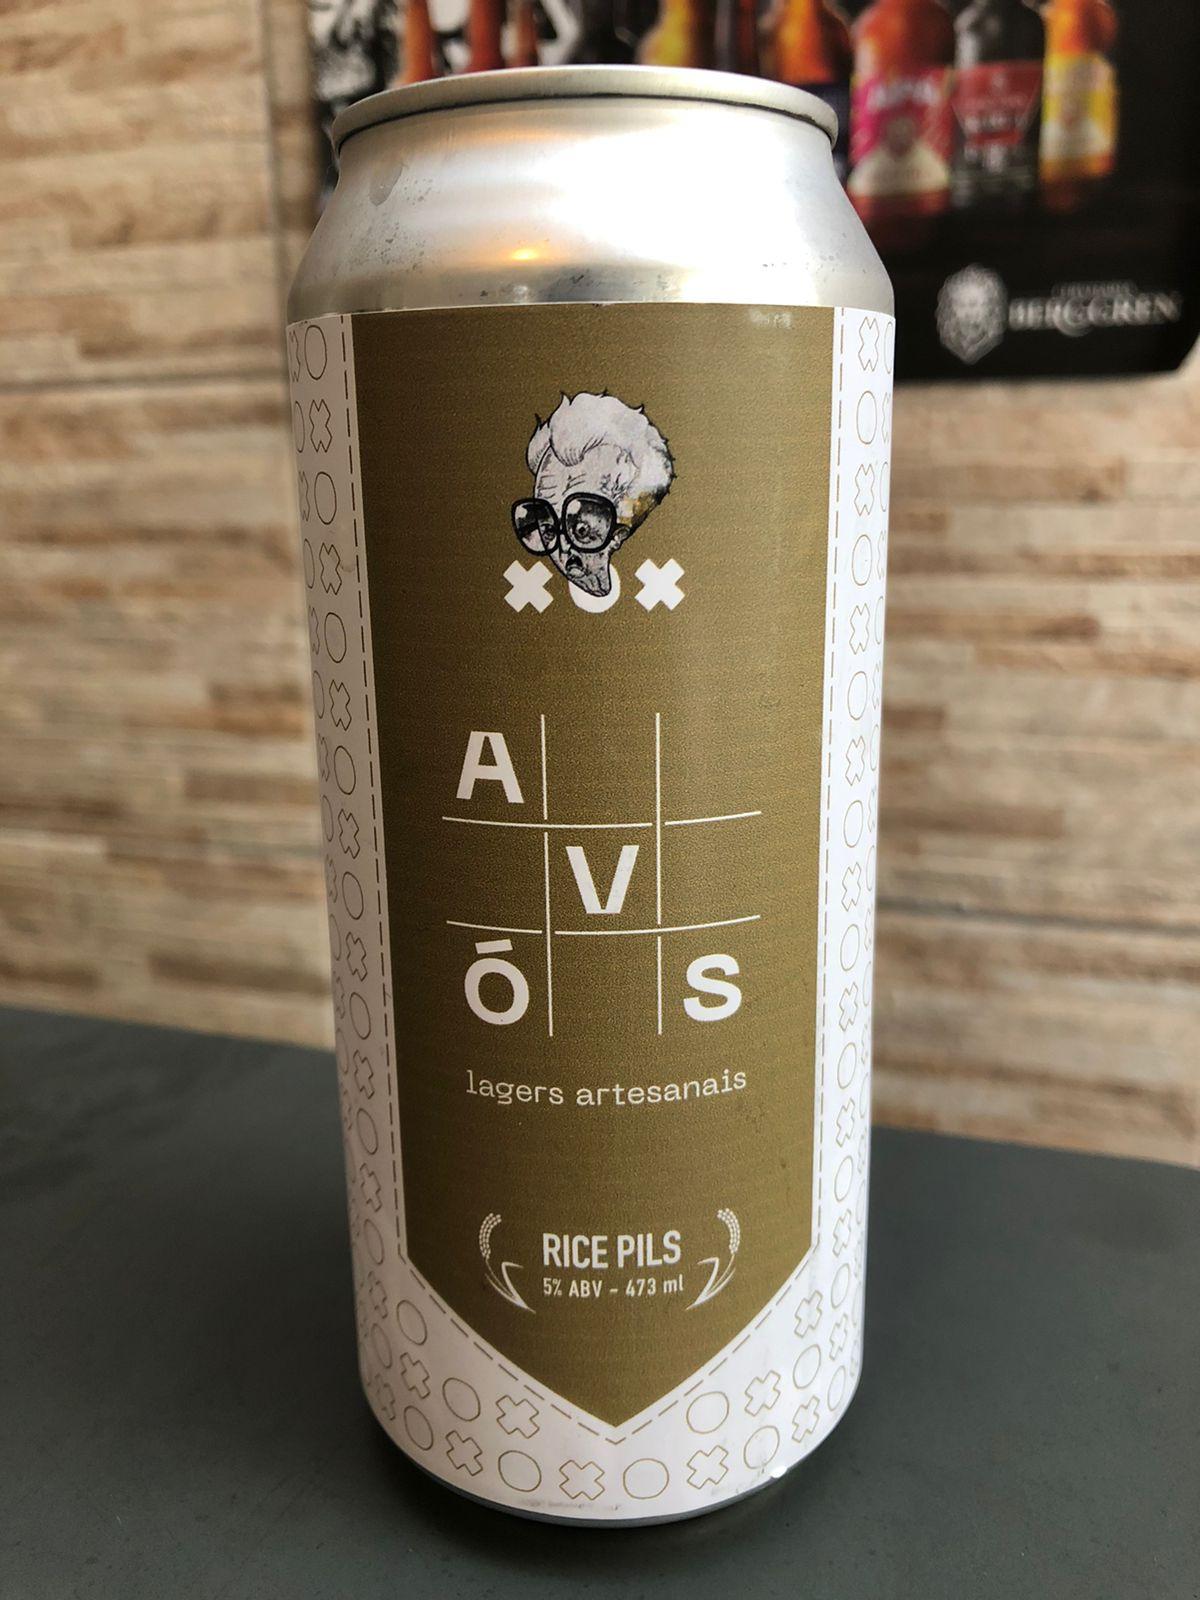 Avós Rice Pils - Lata 473ml